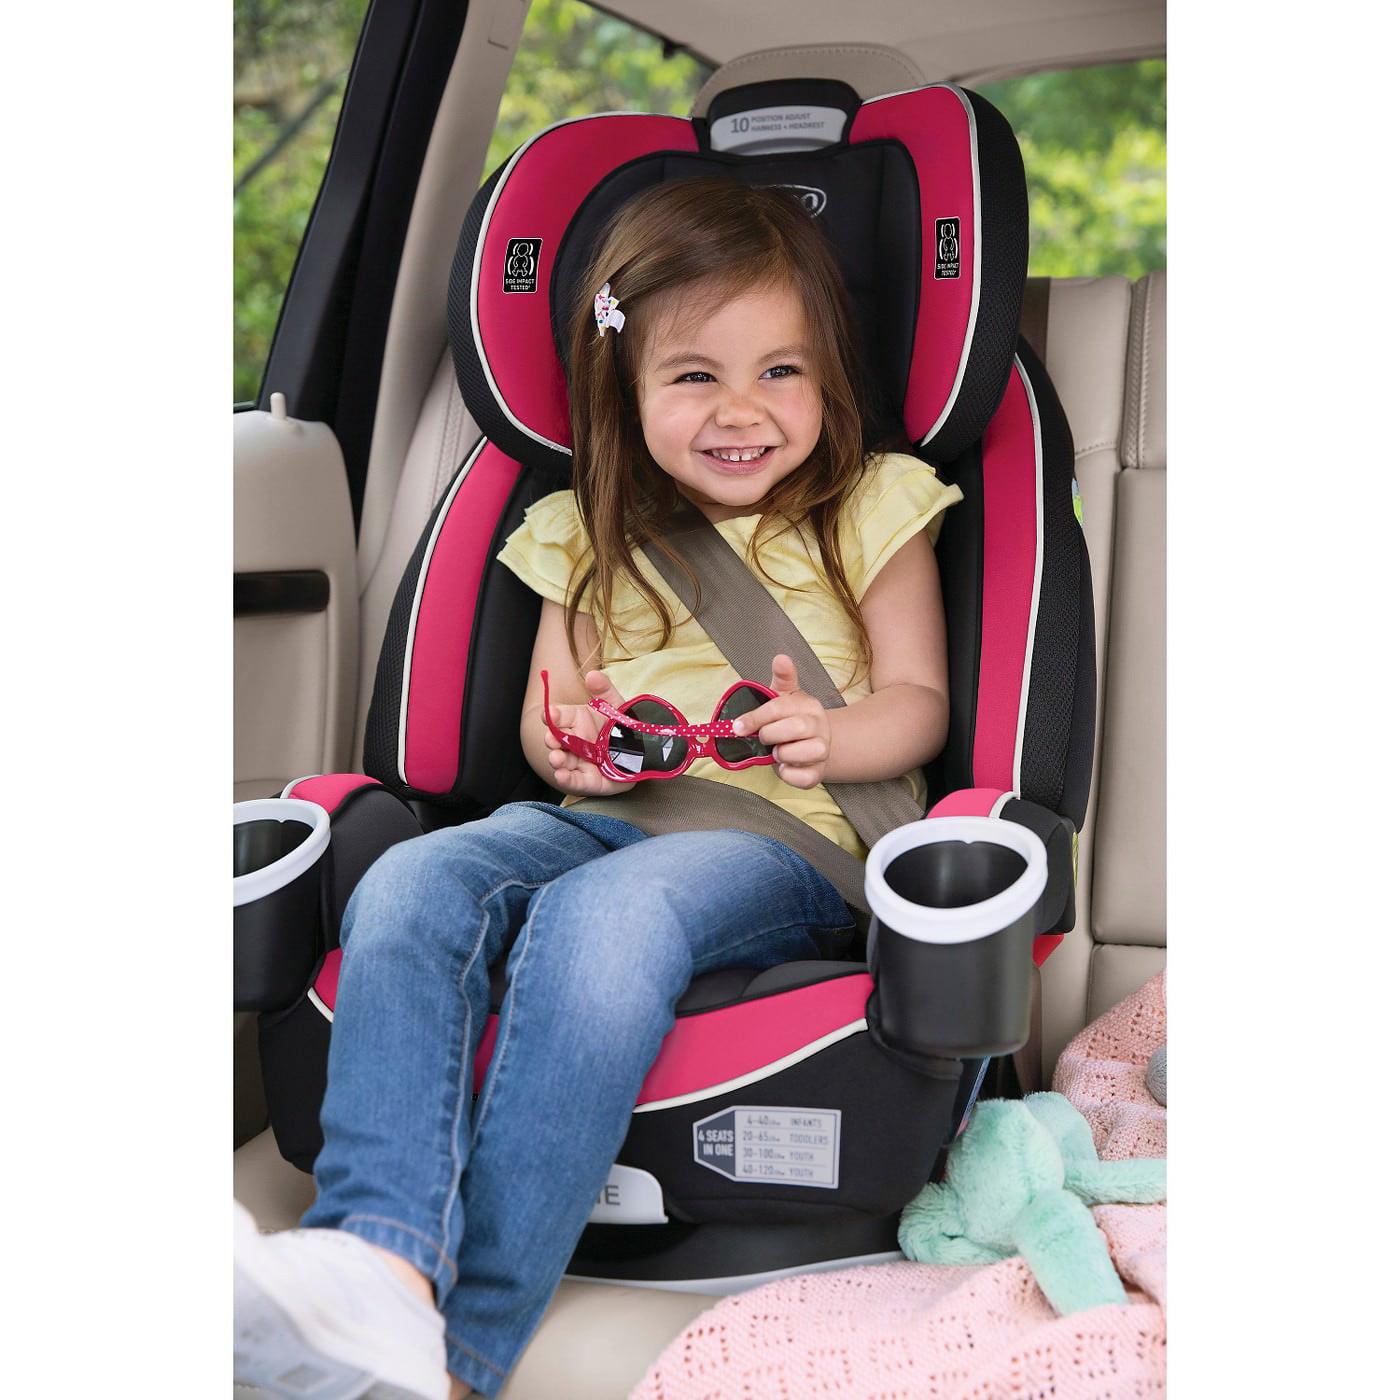 Graco 4ever 4 In 1 Convertible Car Seat Assorted Colors Walmart Com